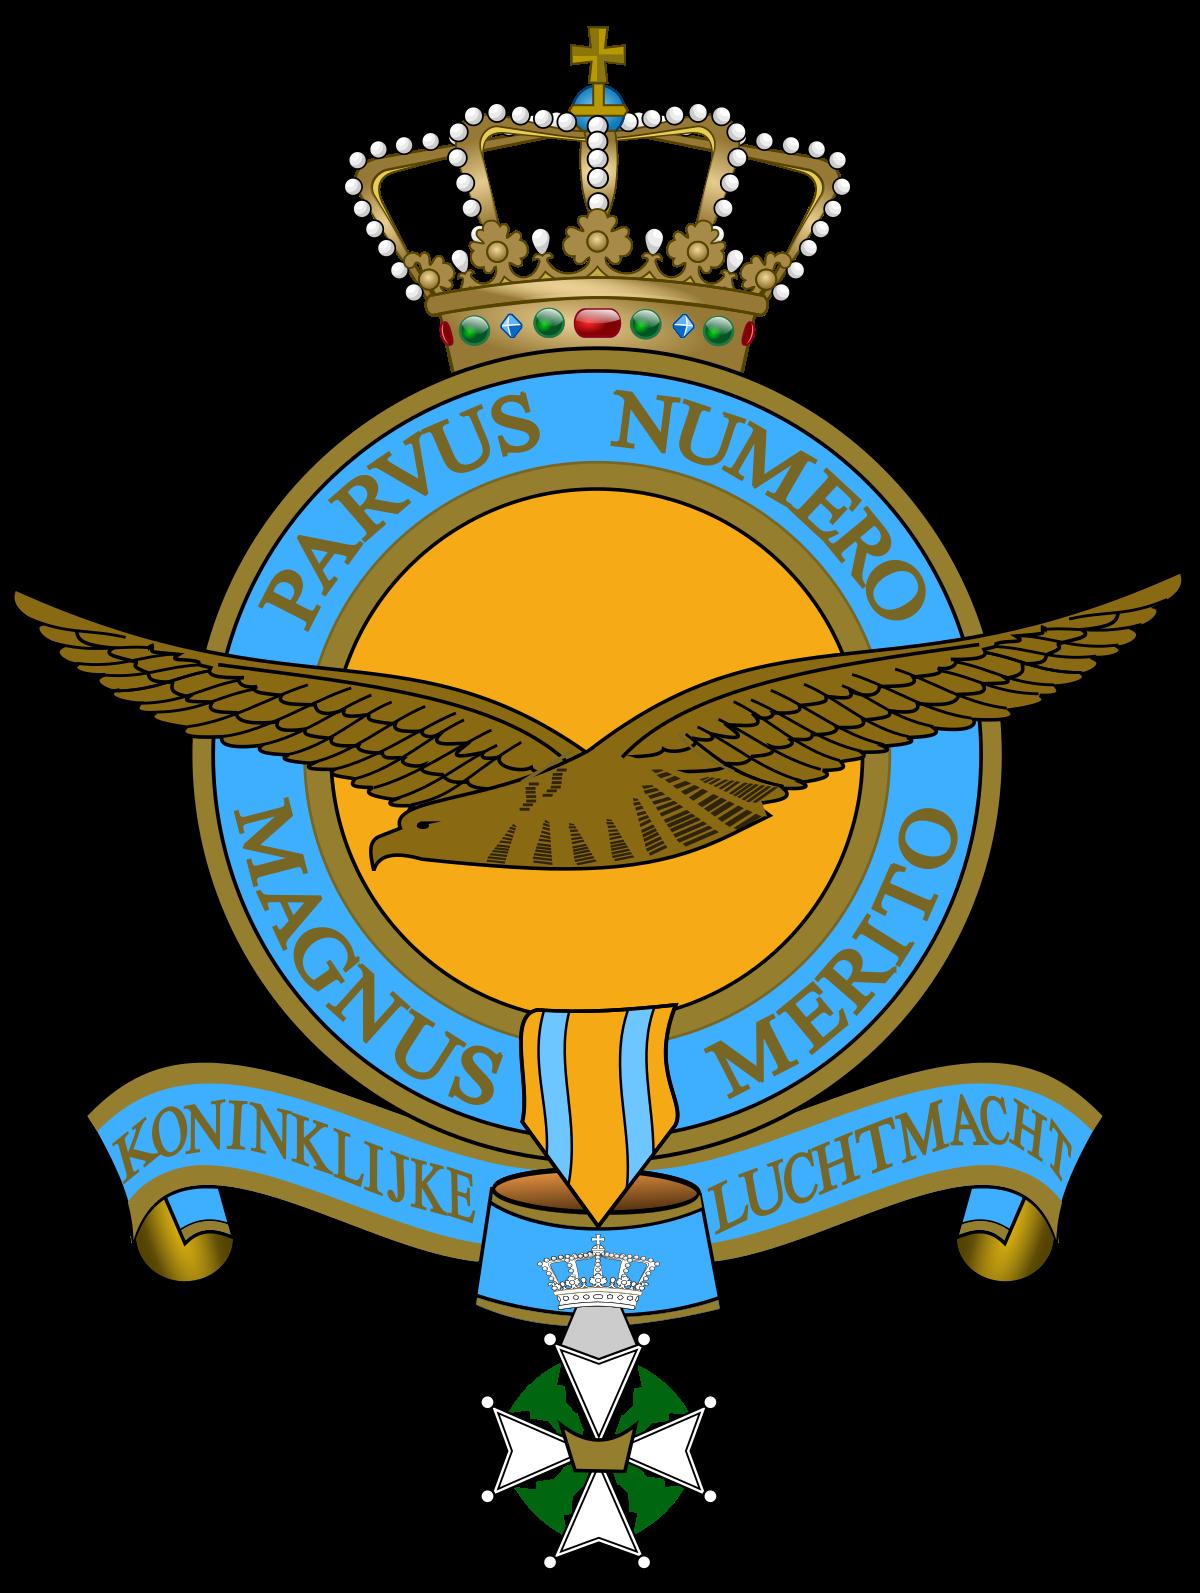 Royal netherlands air force. Pilot clipart fighter pilot